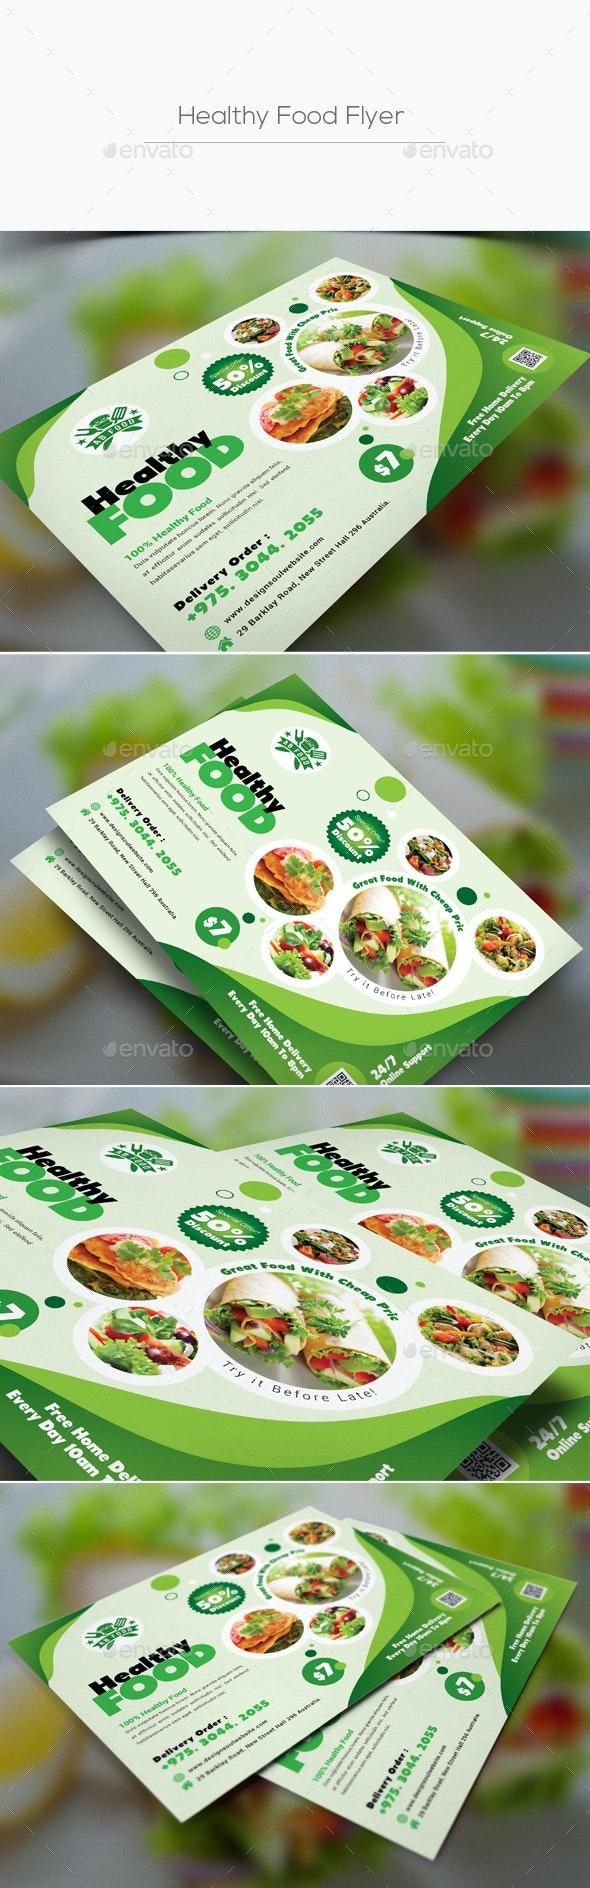 Healthy Food Flyer - Restaurant Flyers